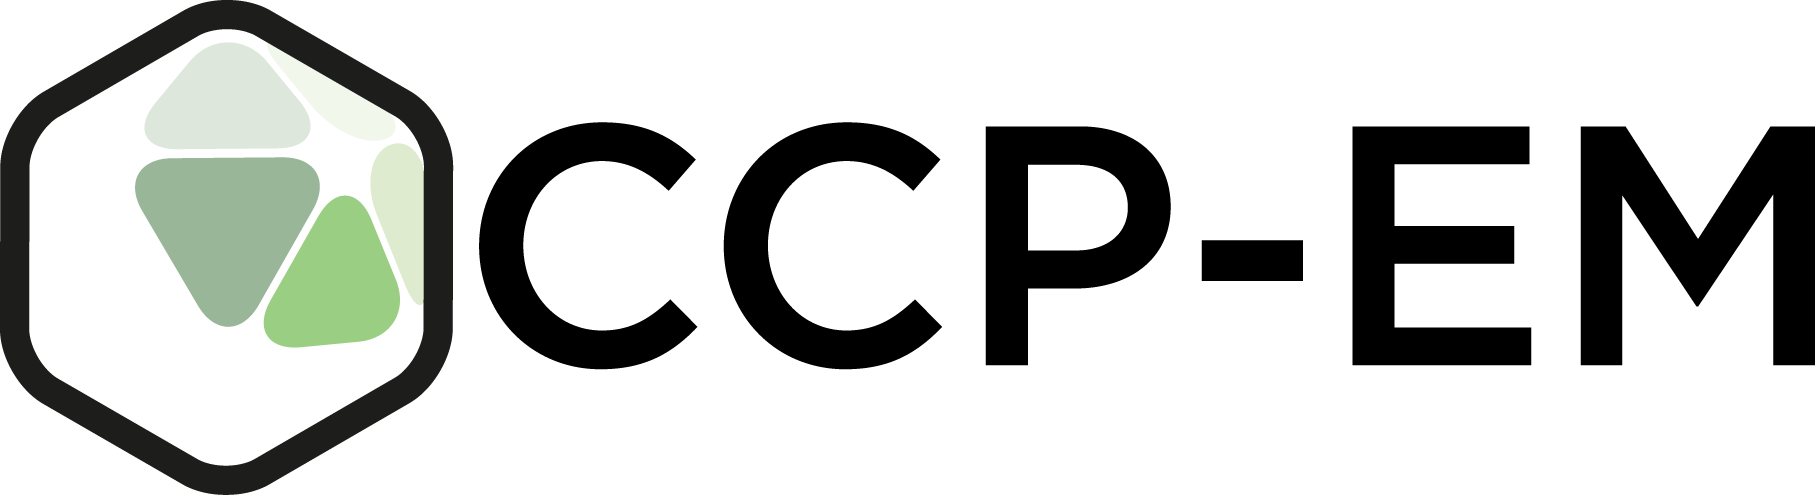 CCPEM